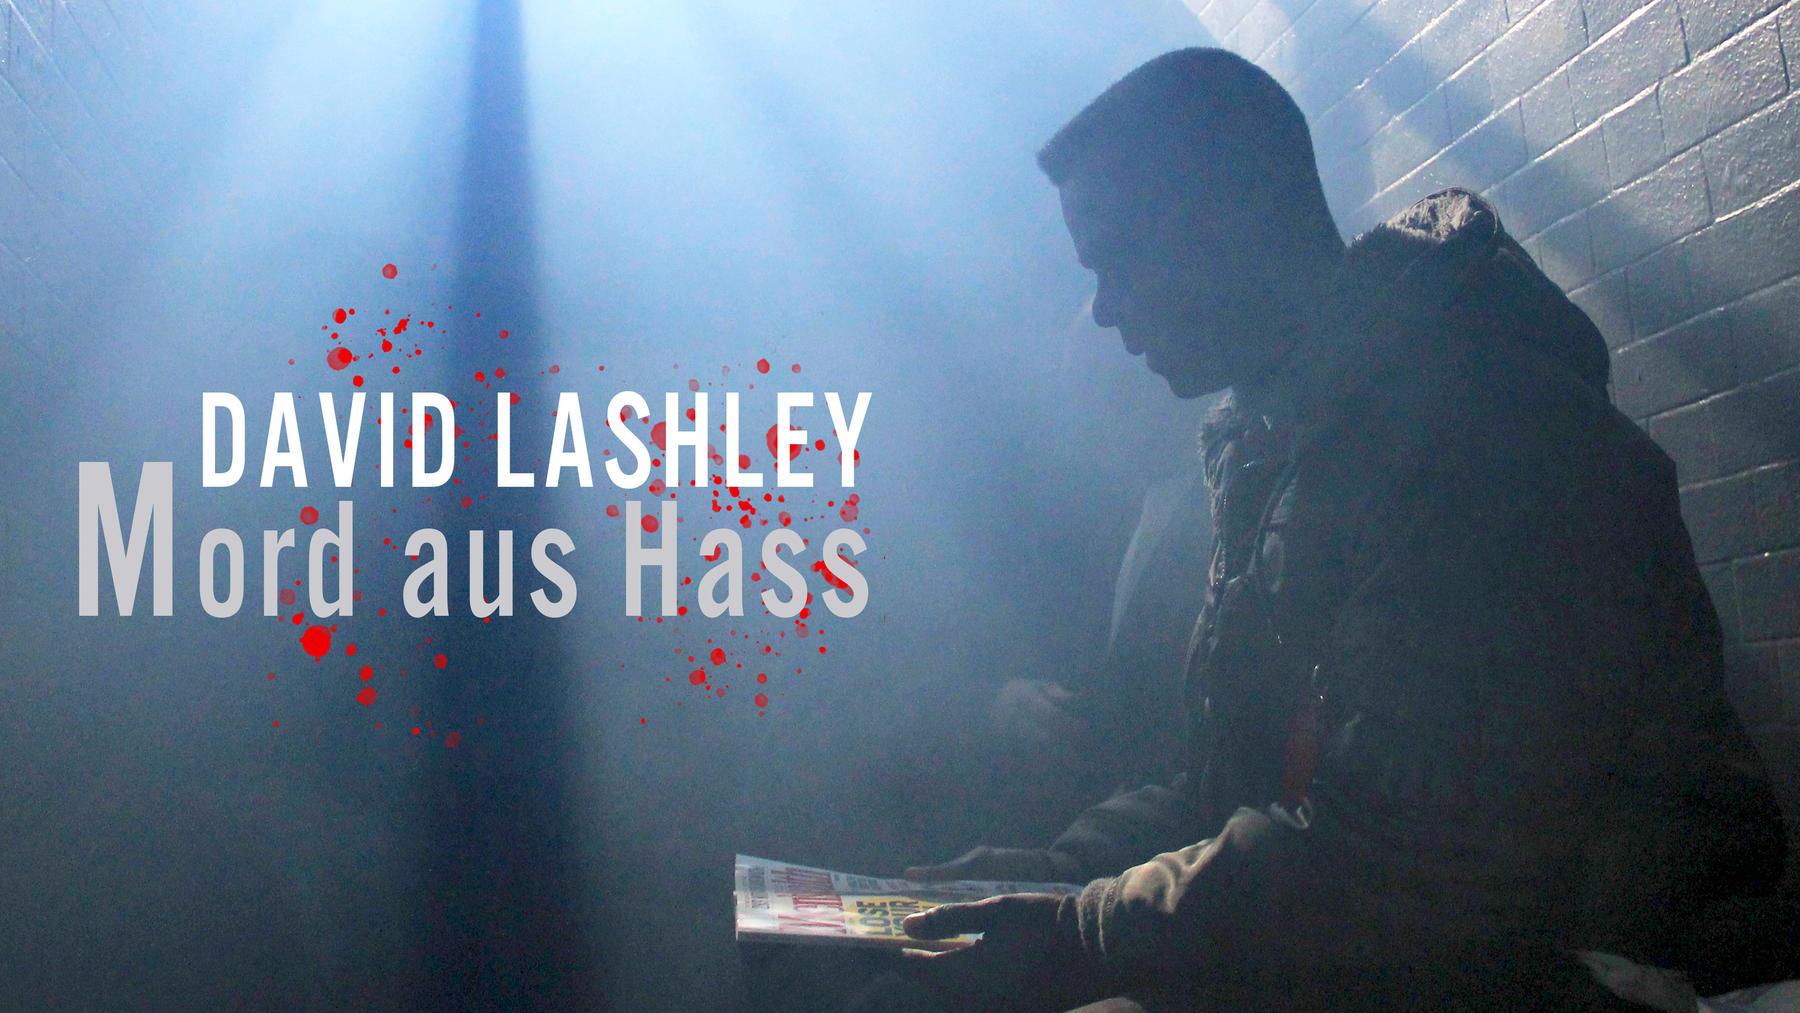 David Lashley: Mord aus Hass